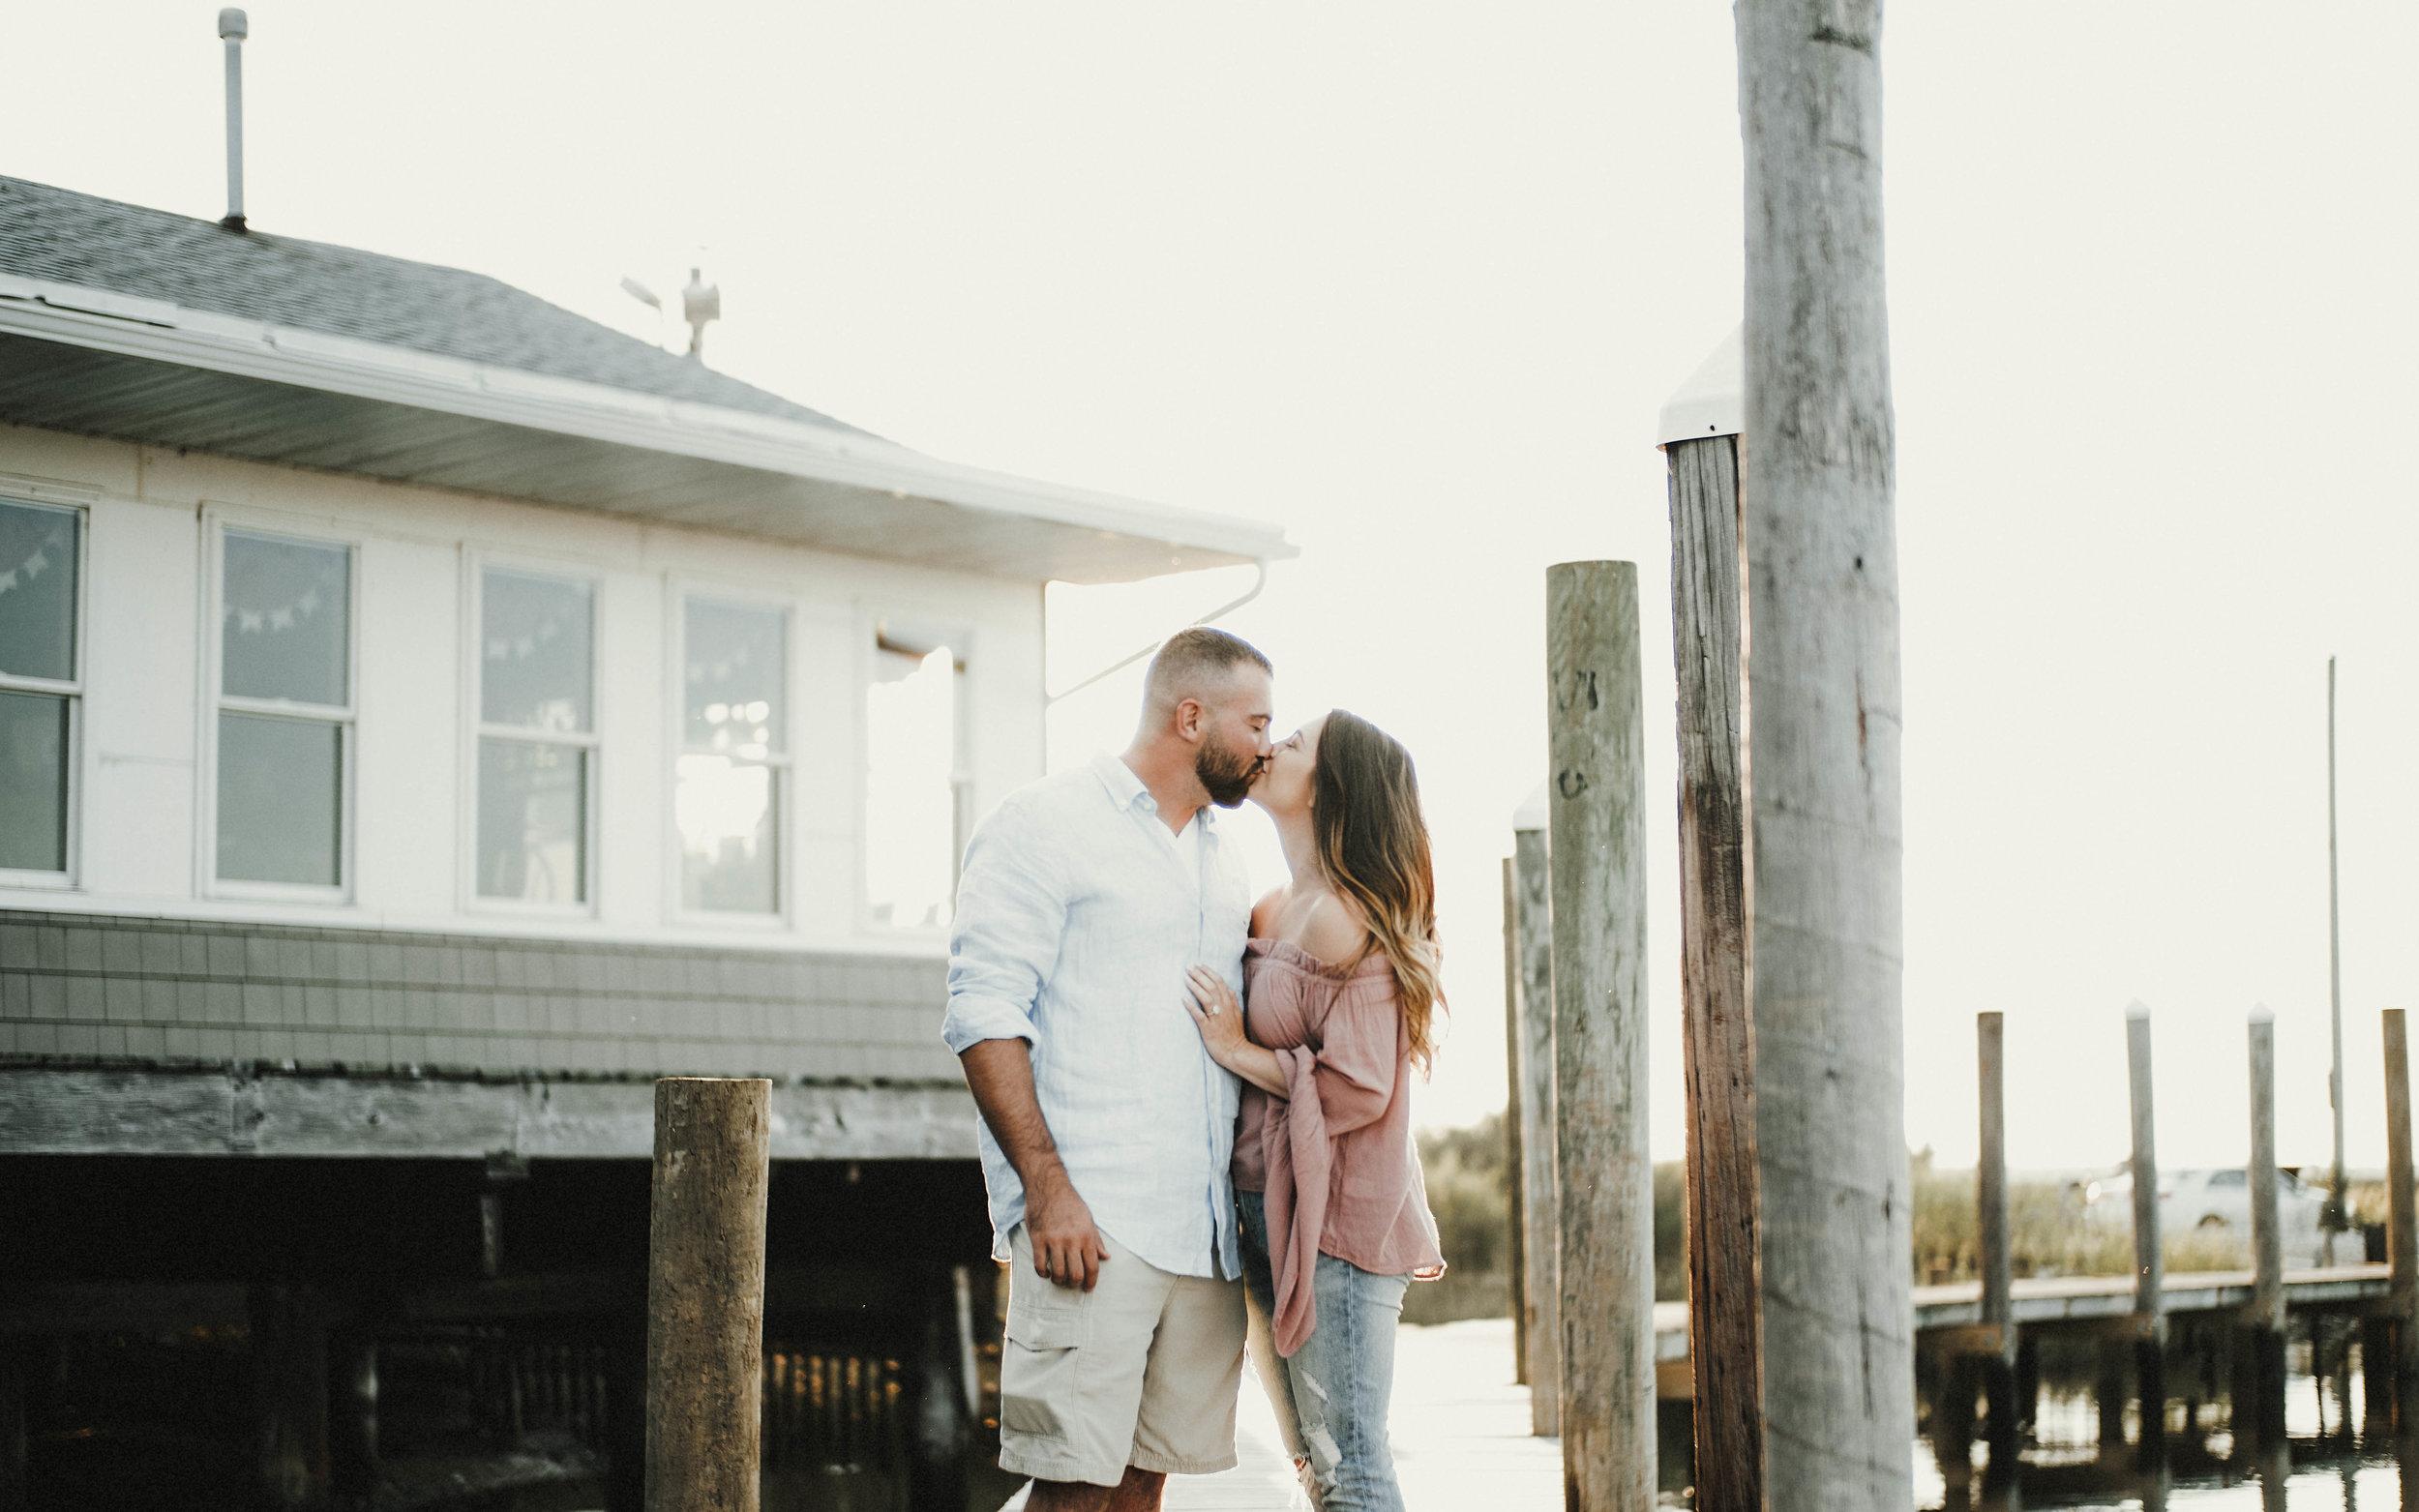 proposal photos / engagement photos / I said yes